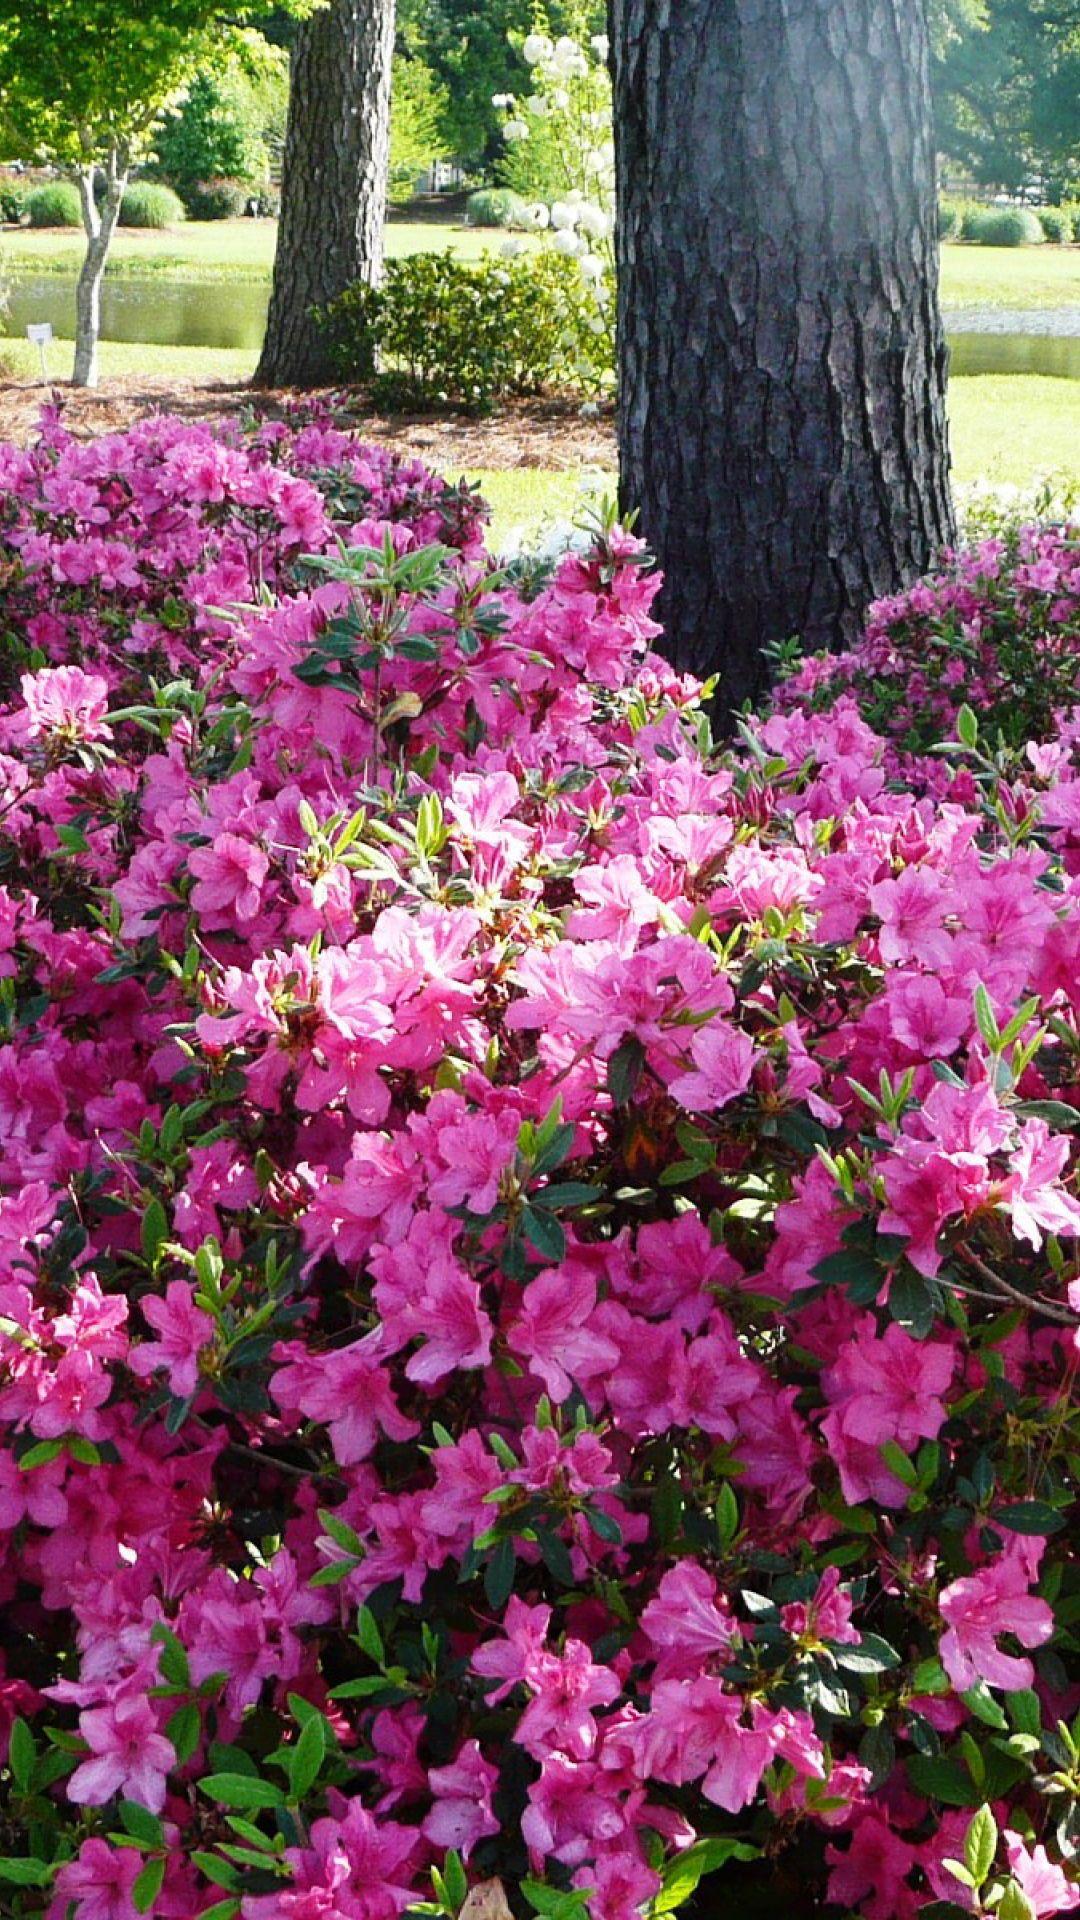 10 Best Uses For Encore Azaleas By Size Azaleas Landscaping Azaleas Garden Garden Design